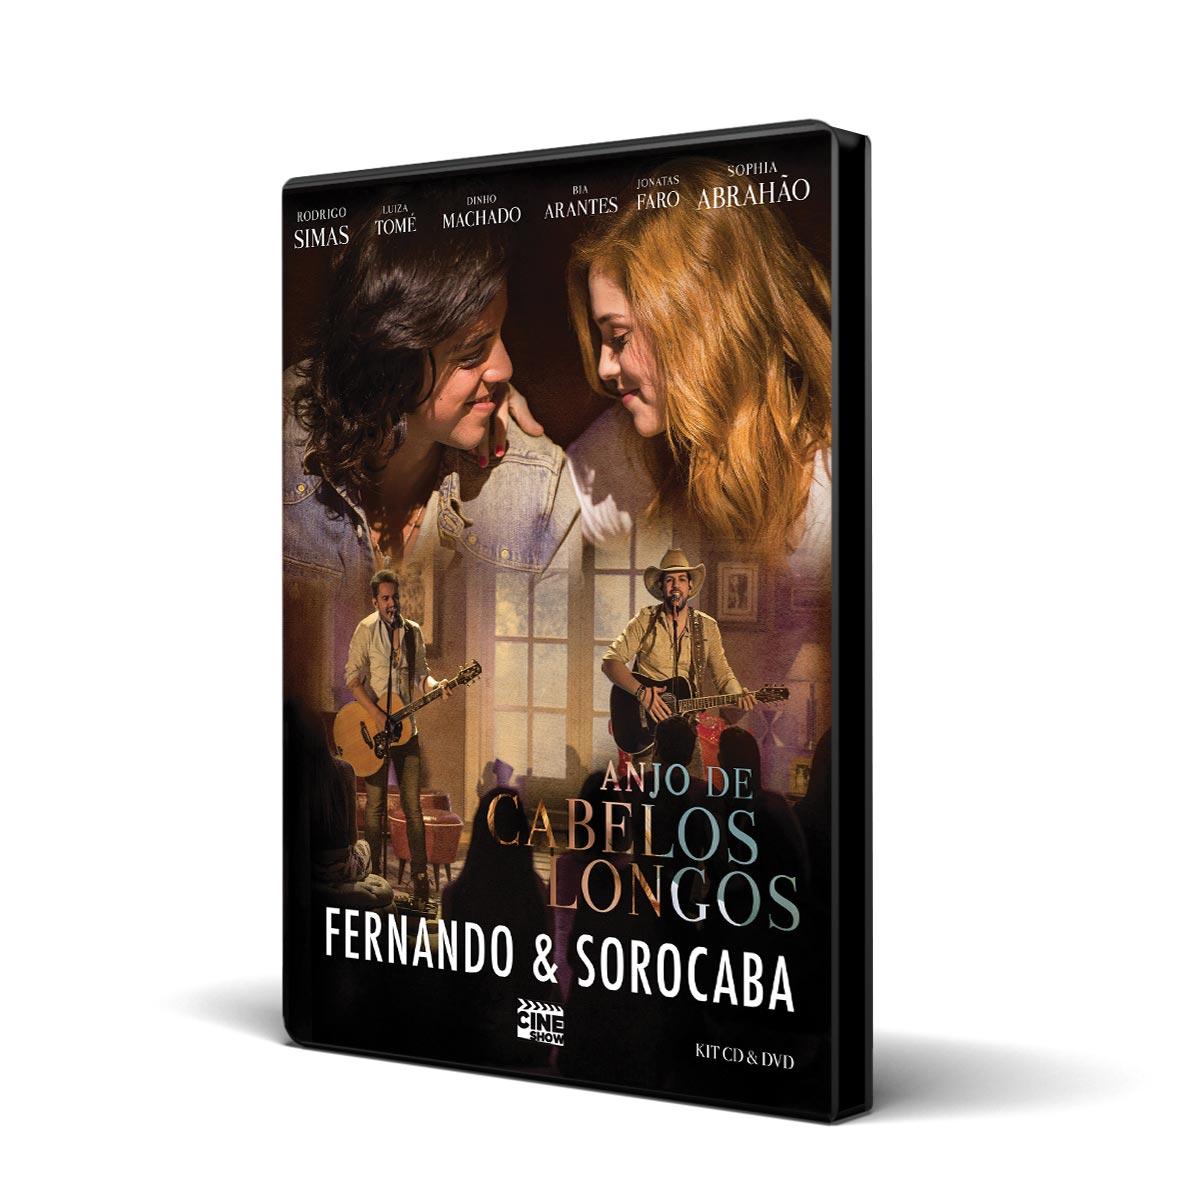 Kit CD + DVD Fernando & Sorocaba Anjo de Cabelos Longos